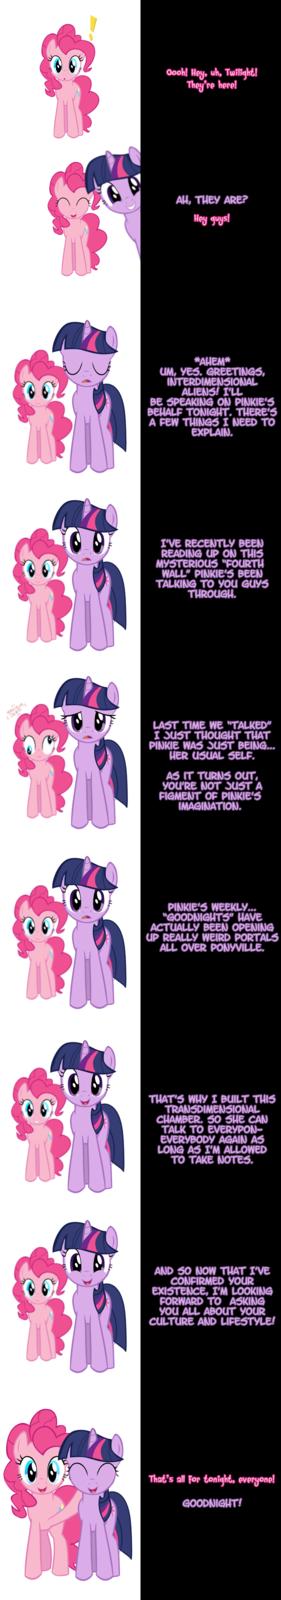 Pinkie and Twilight say Goodnight!